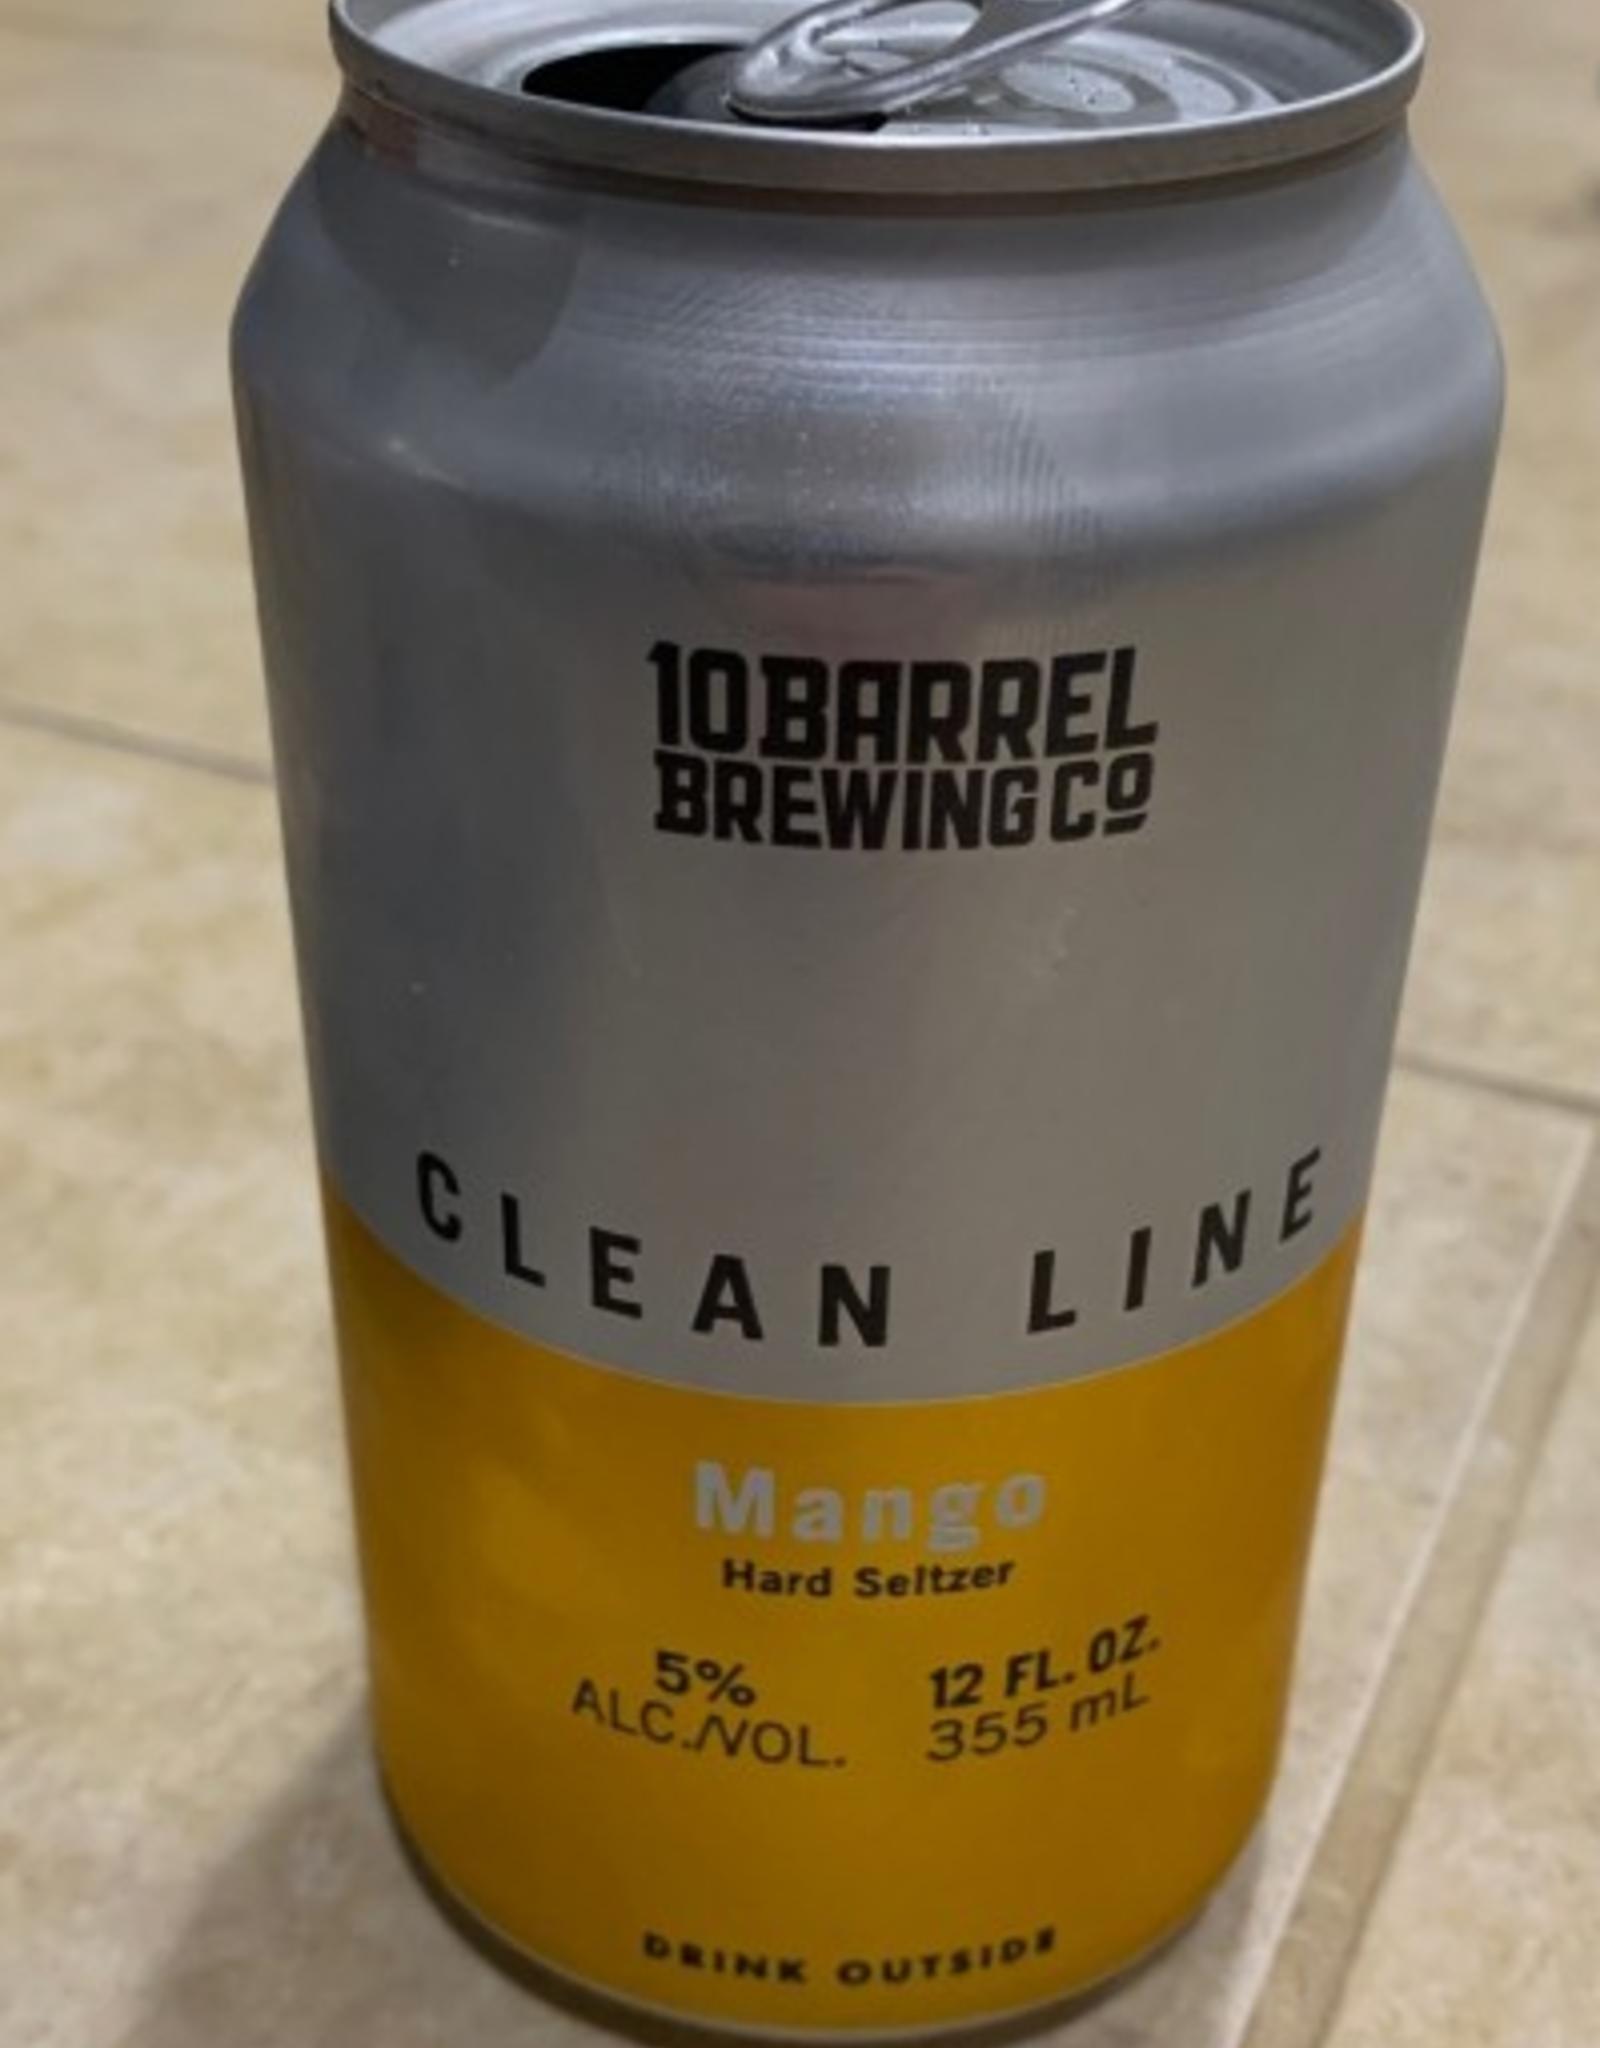 10 Barrel Clean Line Hard Seltzer 6pk cans single